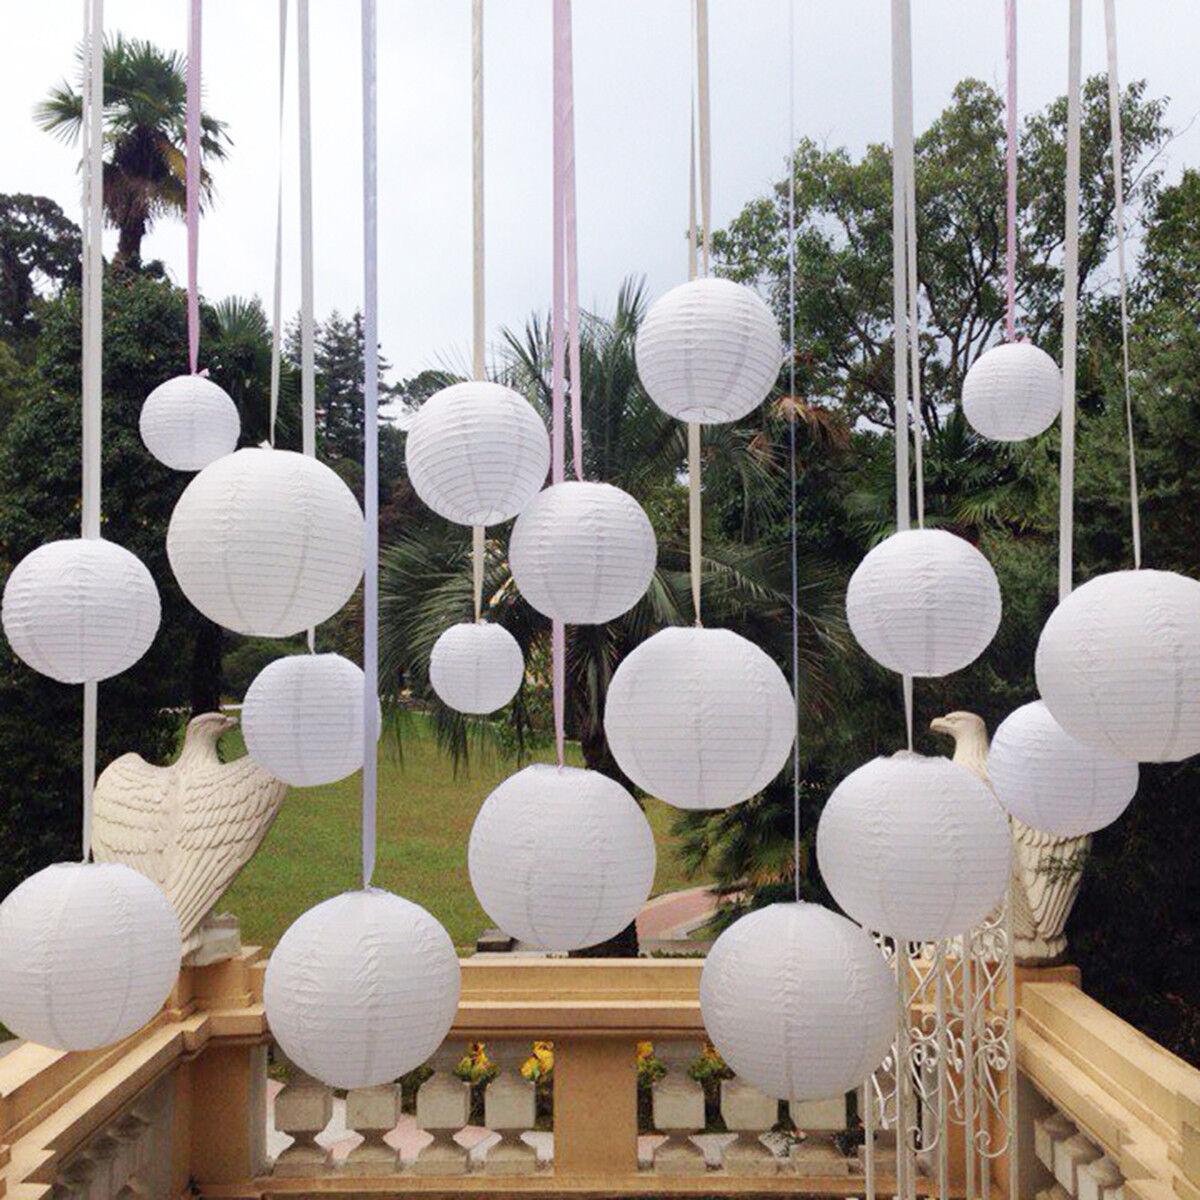 10pc White Chinese Paper Lanterns GRADUATION Party Decoratio